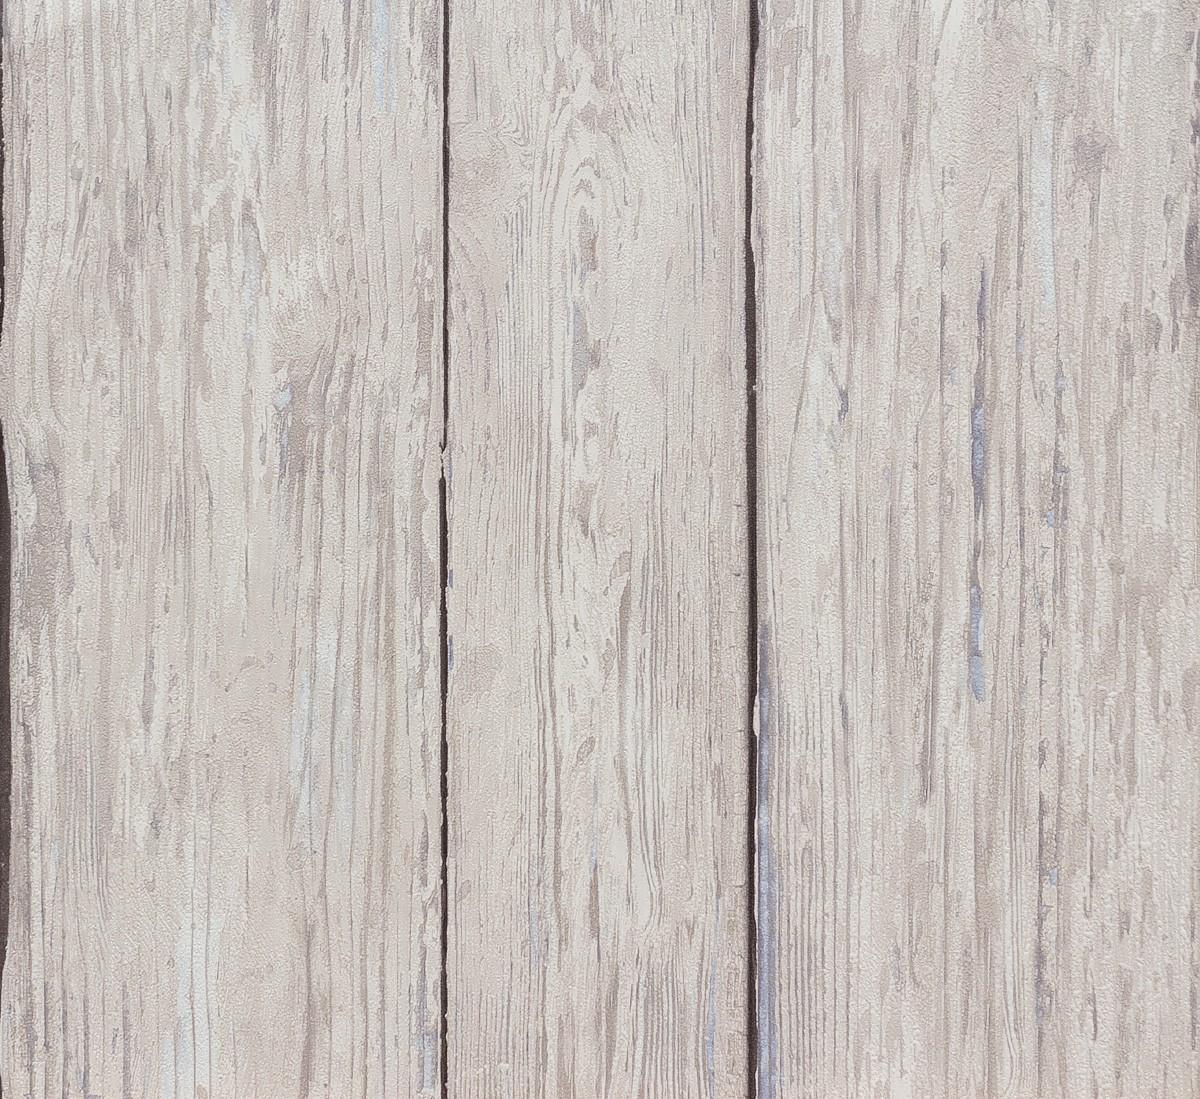 tapete vlies holz creme grau marburg attitude 56203. Black Bedroom Furniture Sets. Home Design Ideas